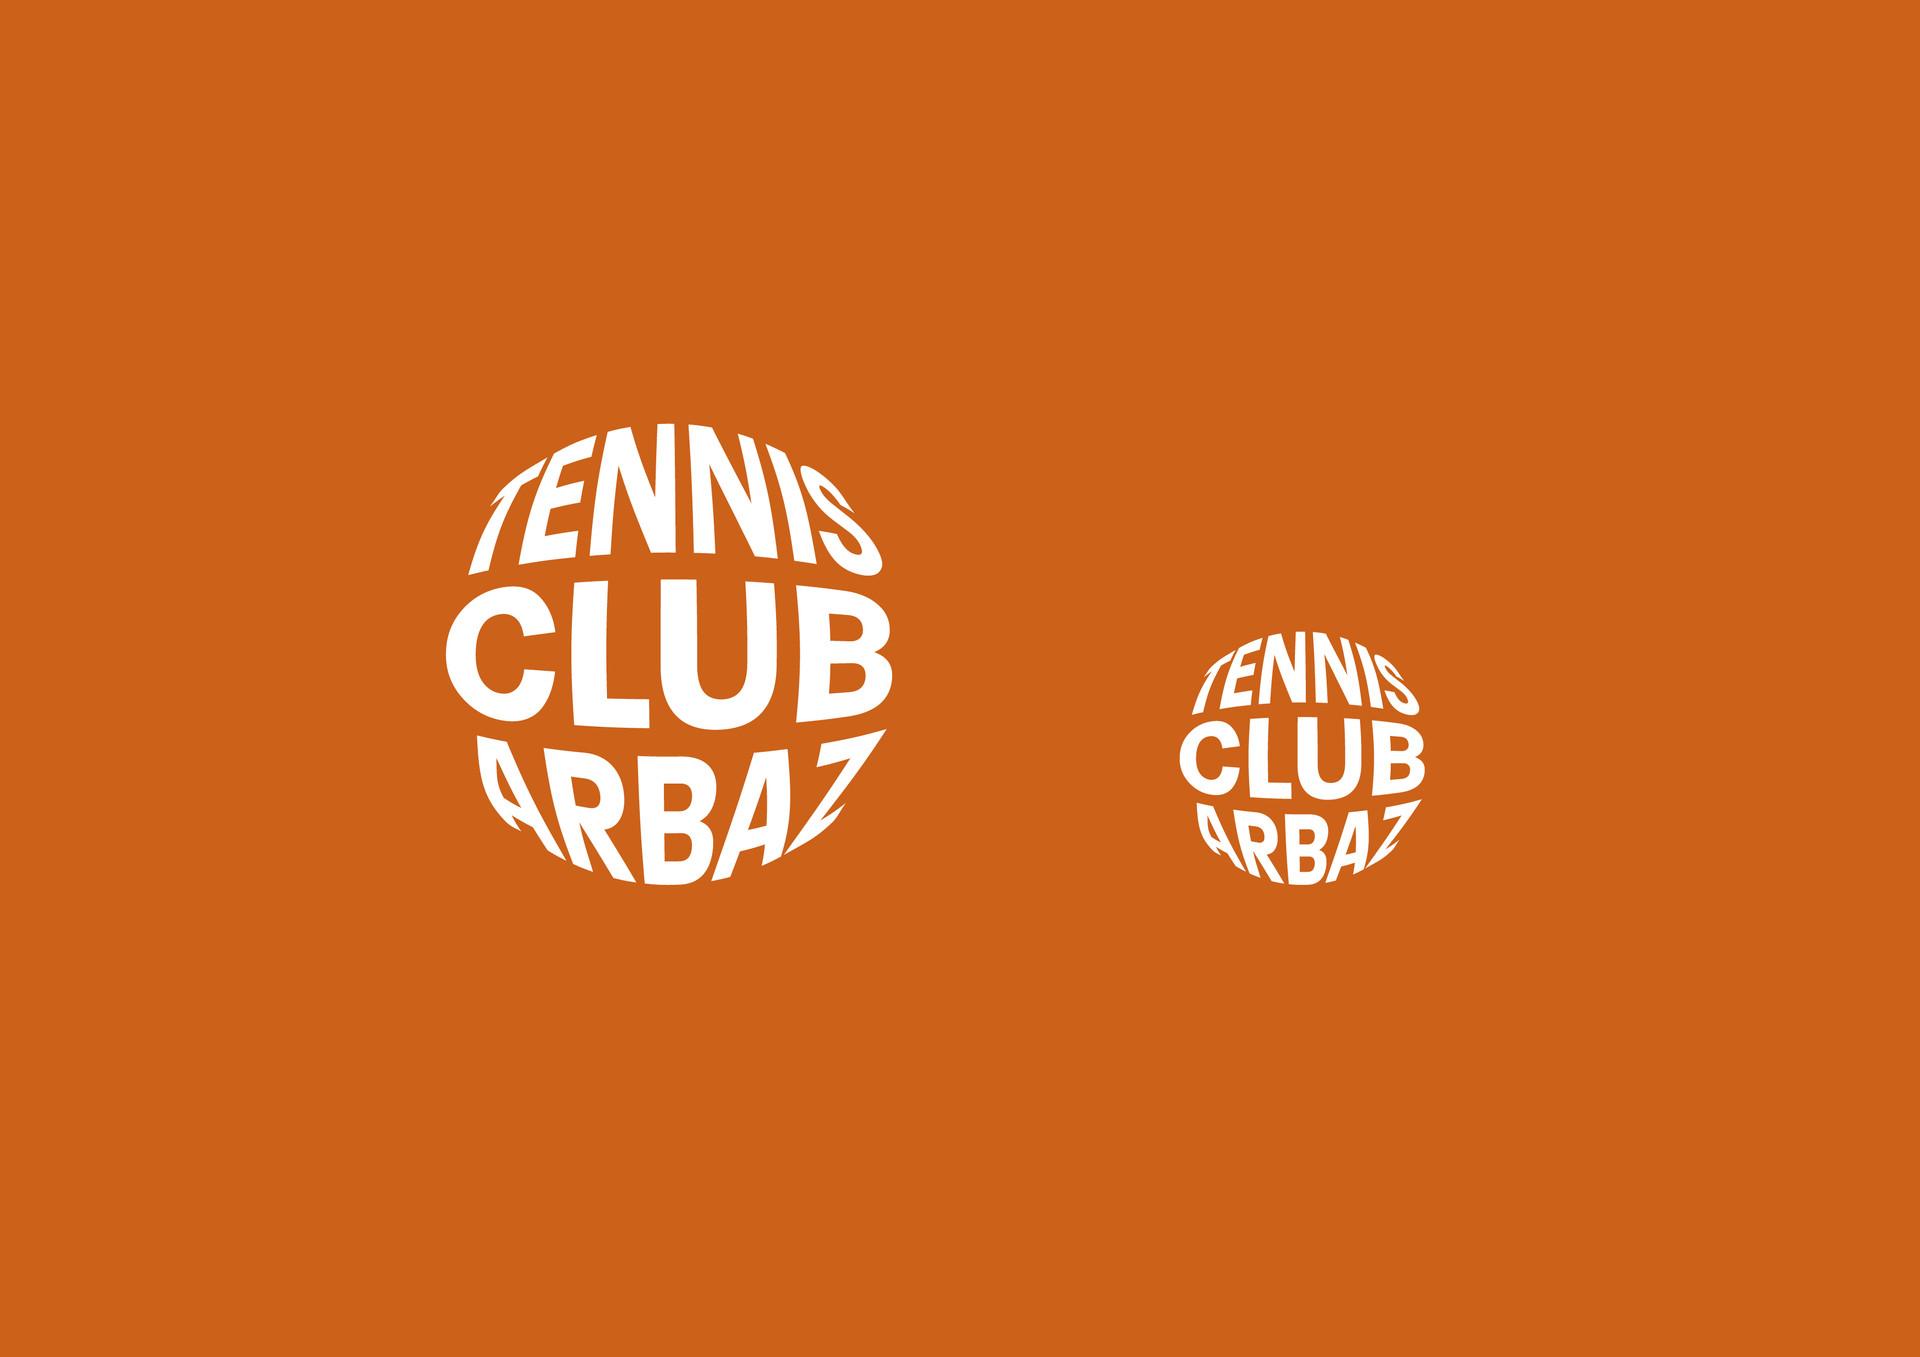 TENNIS-CLUB-ARBAZ-WEB.jpg